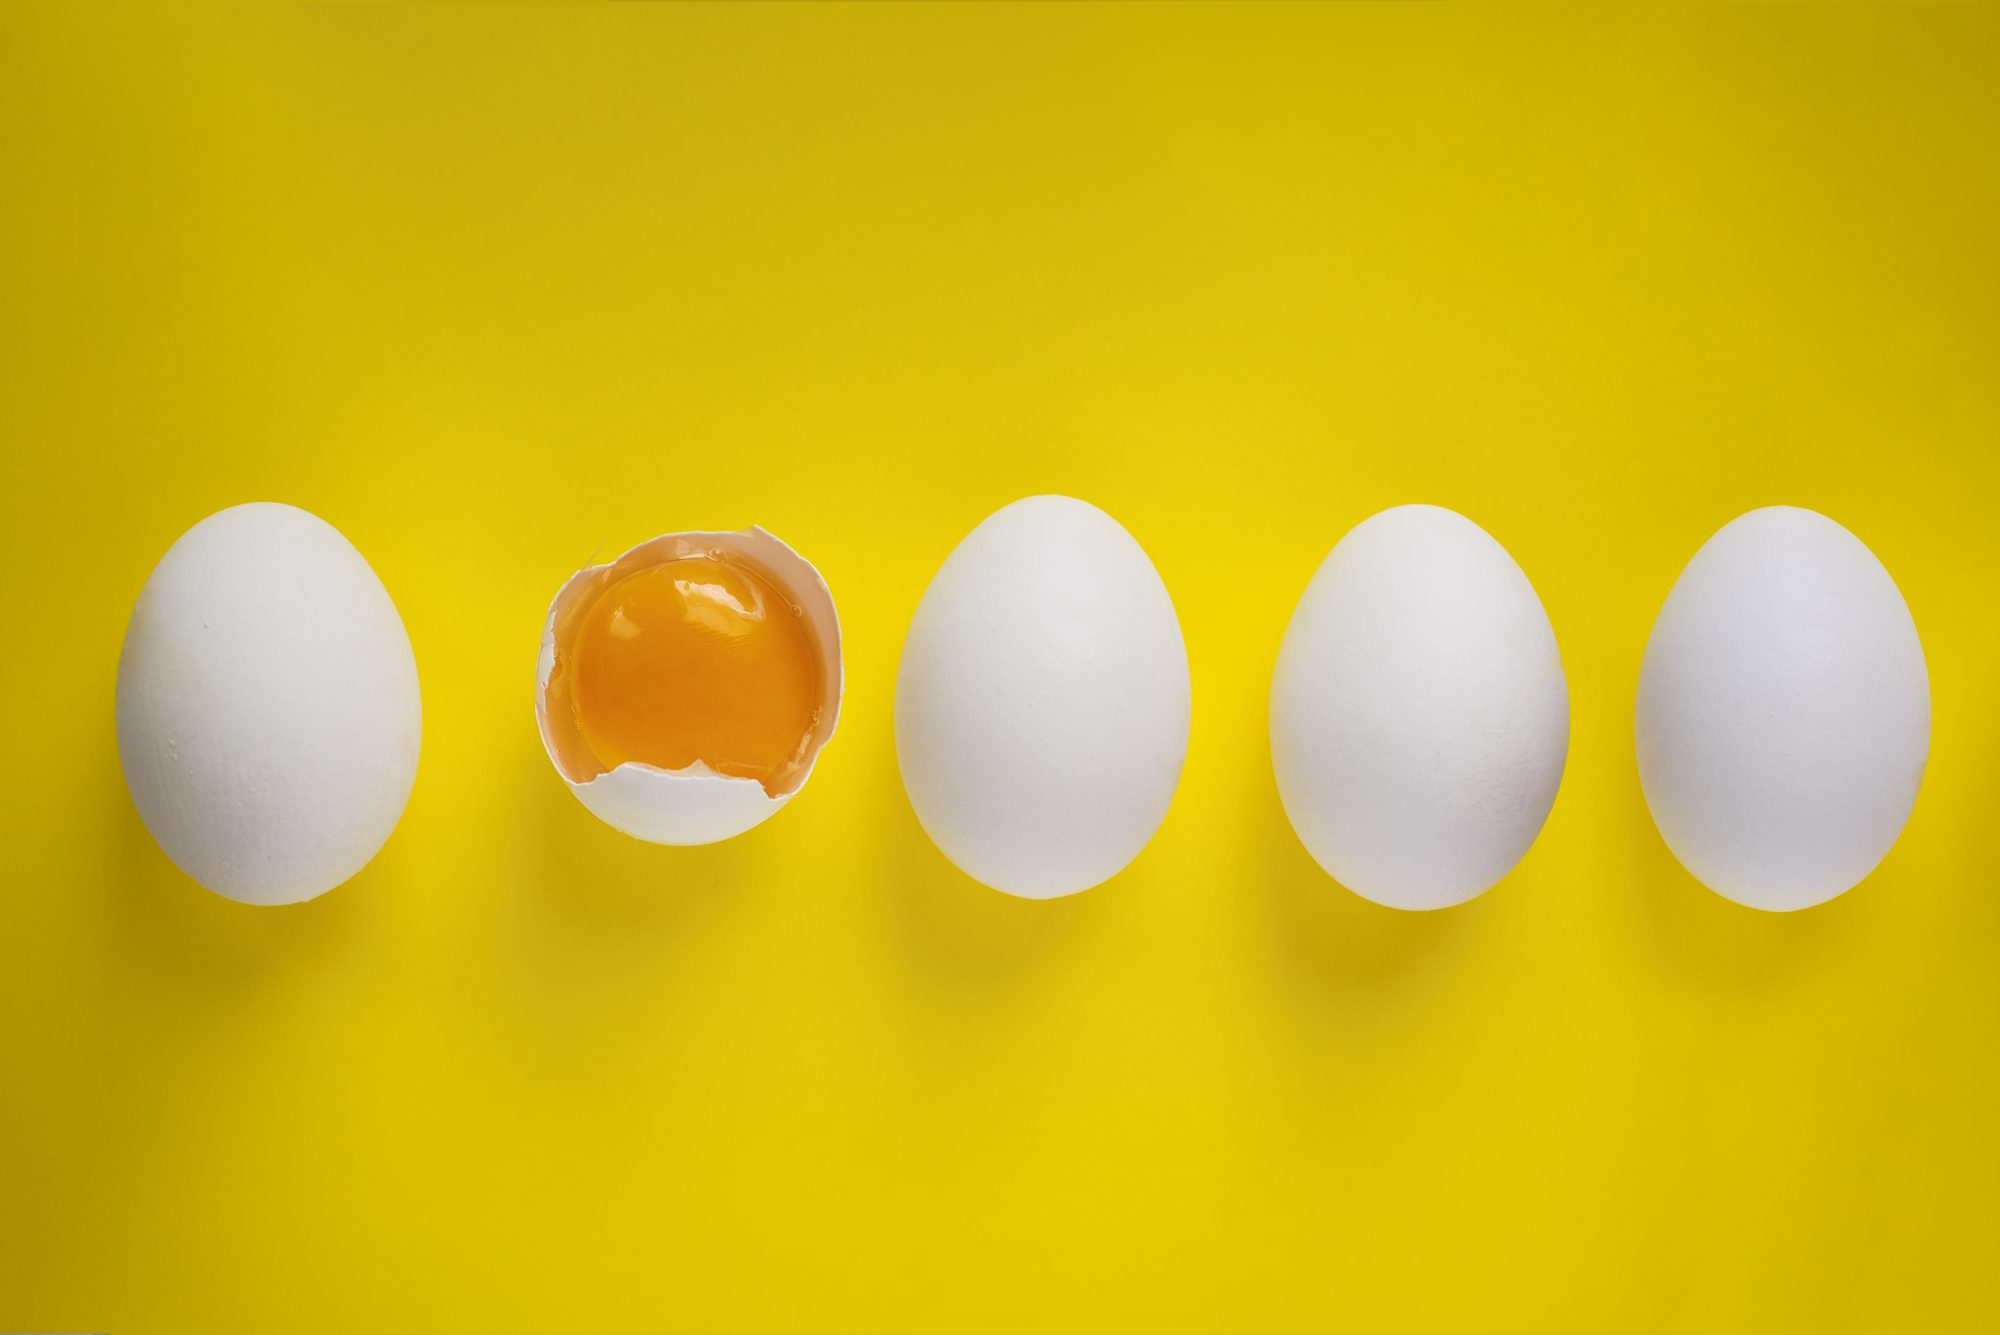 Eggs Getty 1/30/20